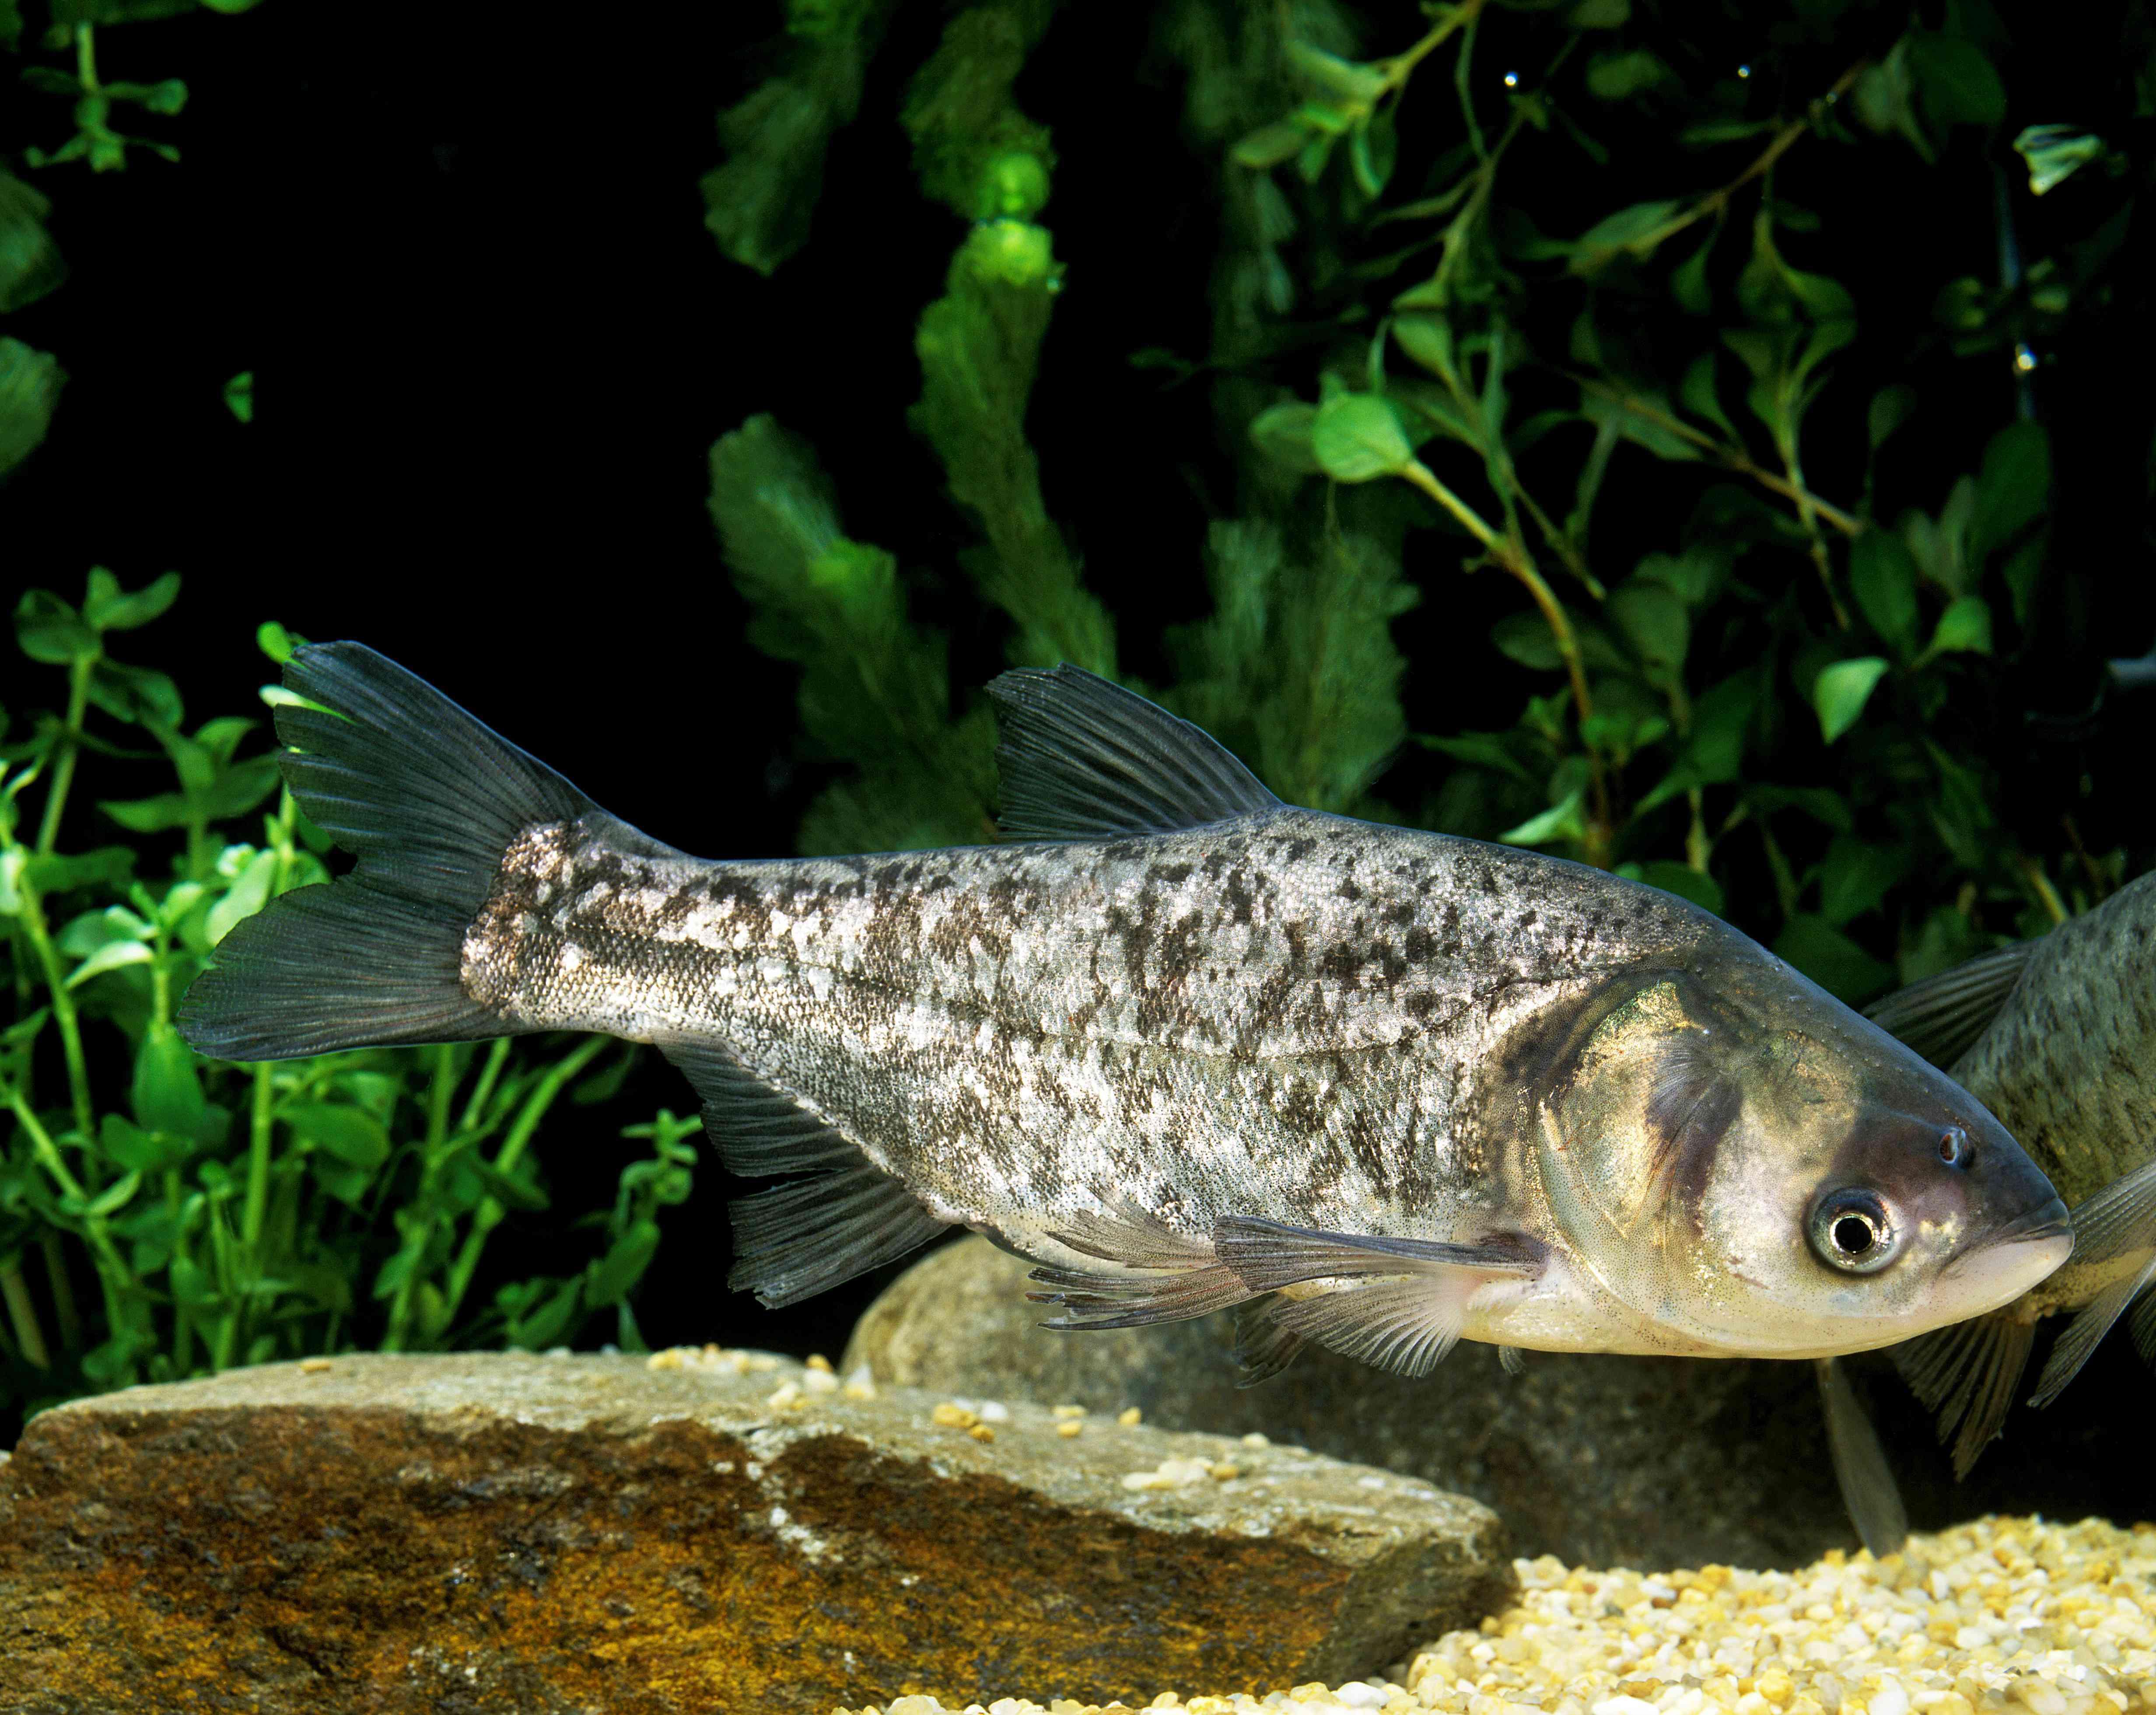 Silver Carp, hypophthalmichthys molitrix, Adult